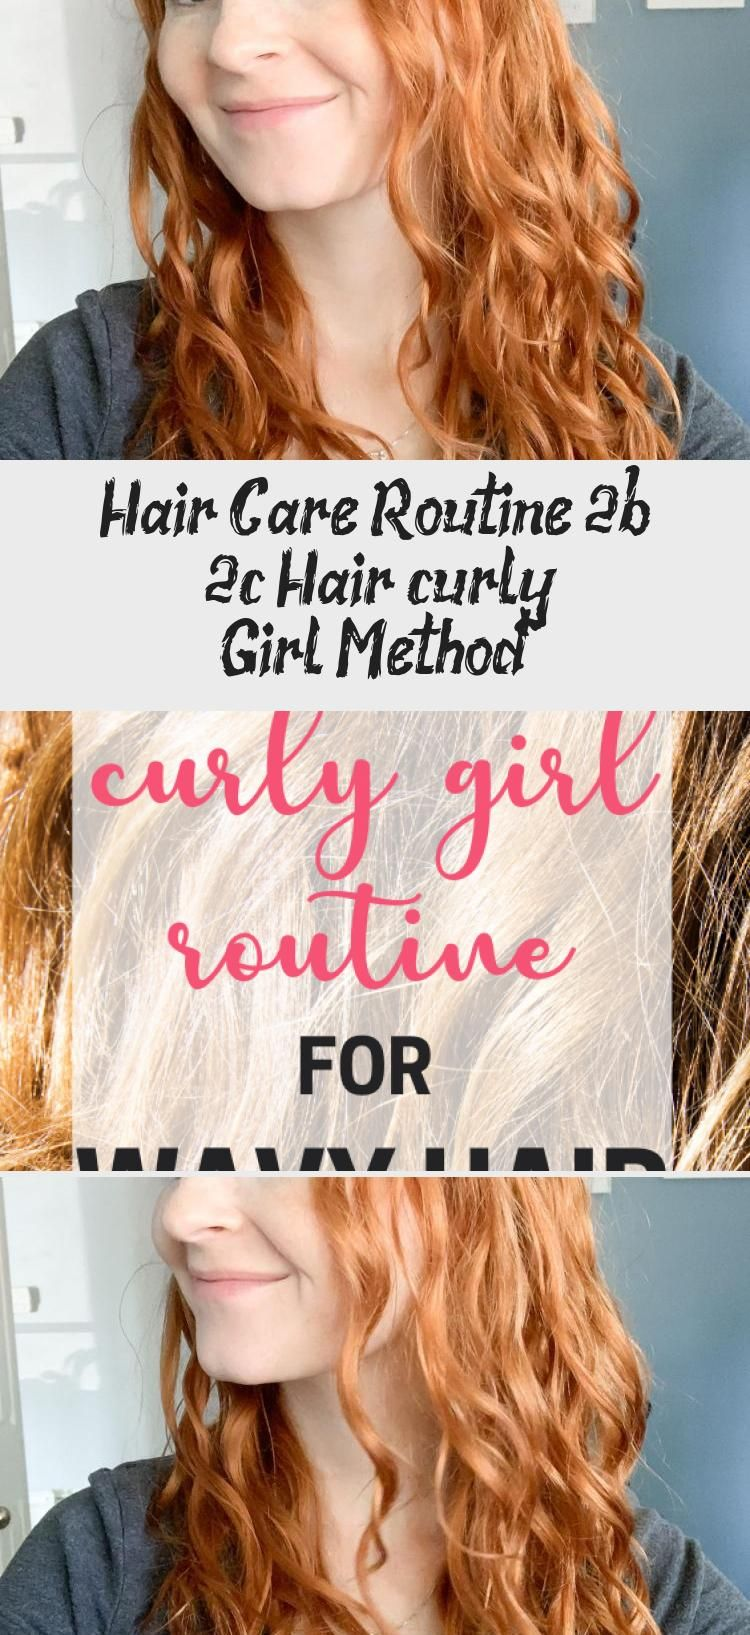 Hair care routine 2b 2c hair curly girl method in 2020